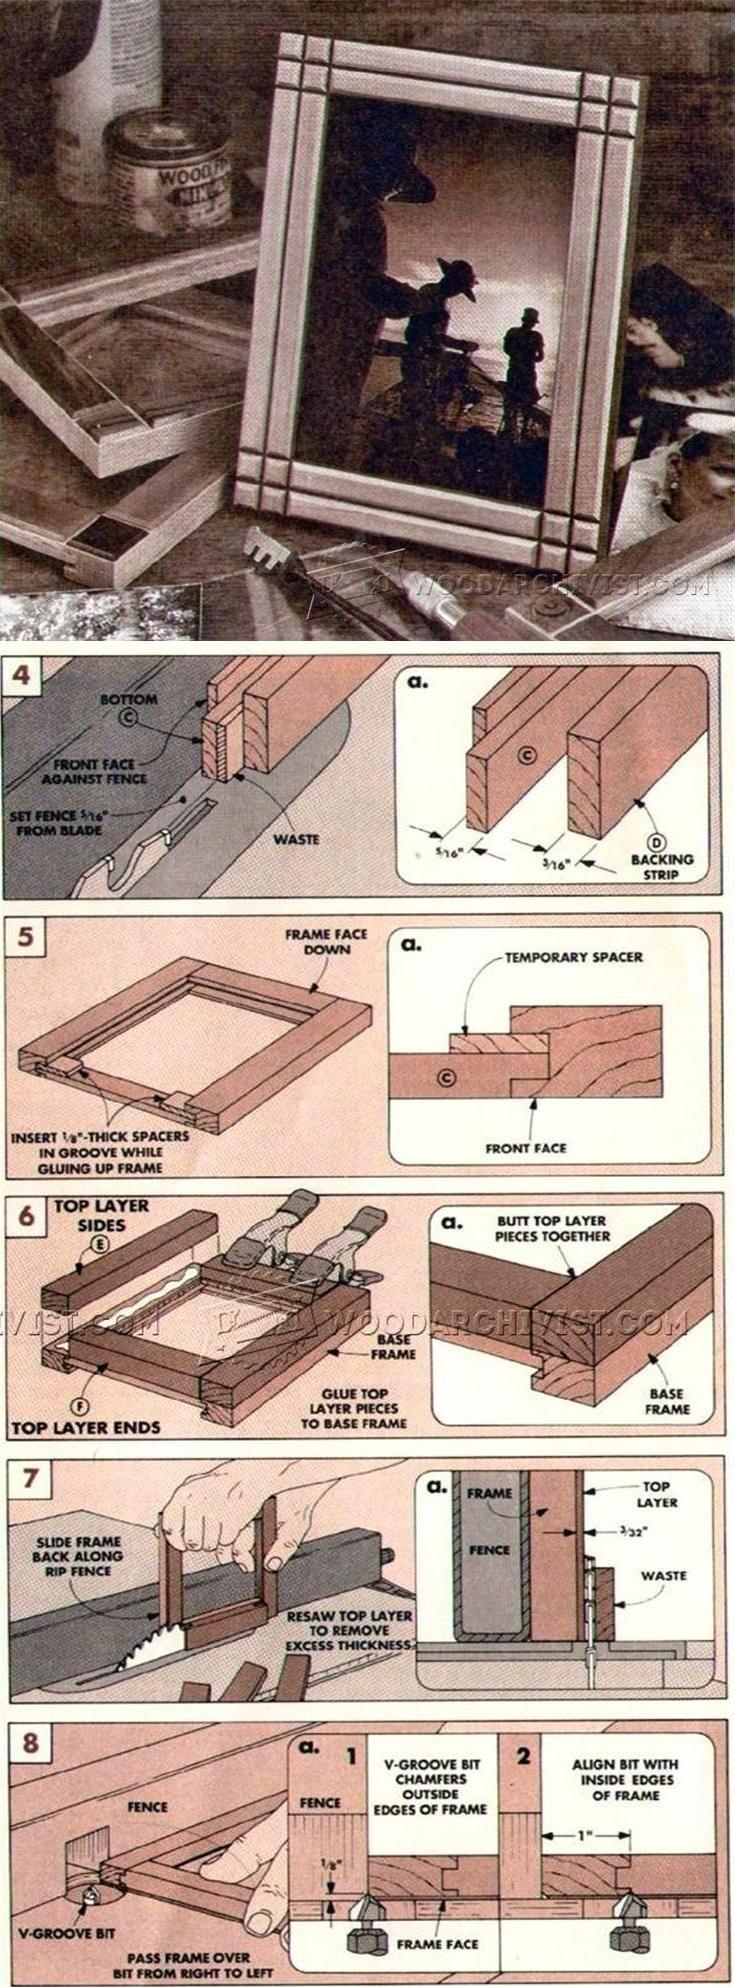 Desk Picture Frames Plans - Woodworking Plans and Projects   WoodArchivist.com